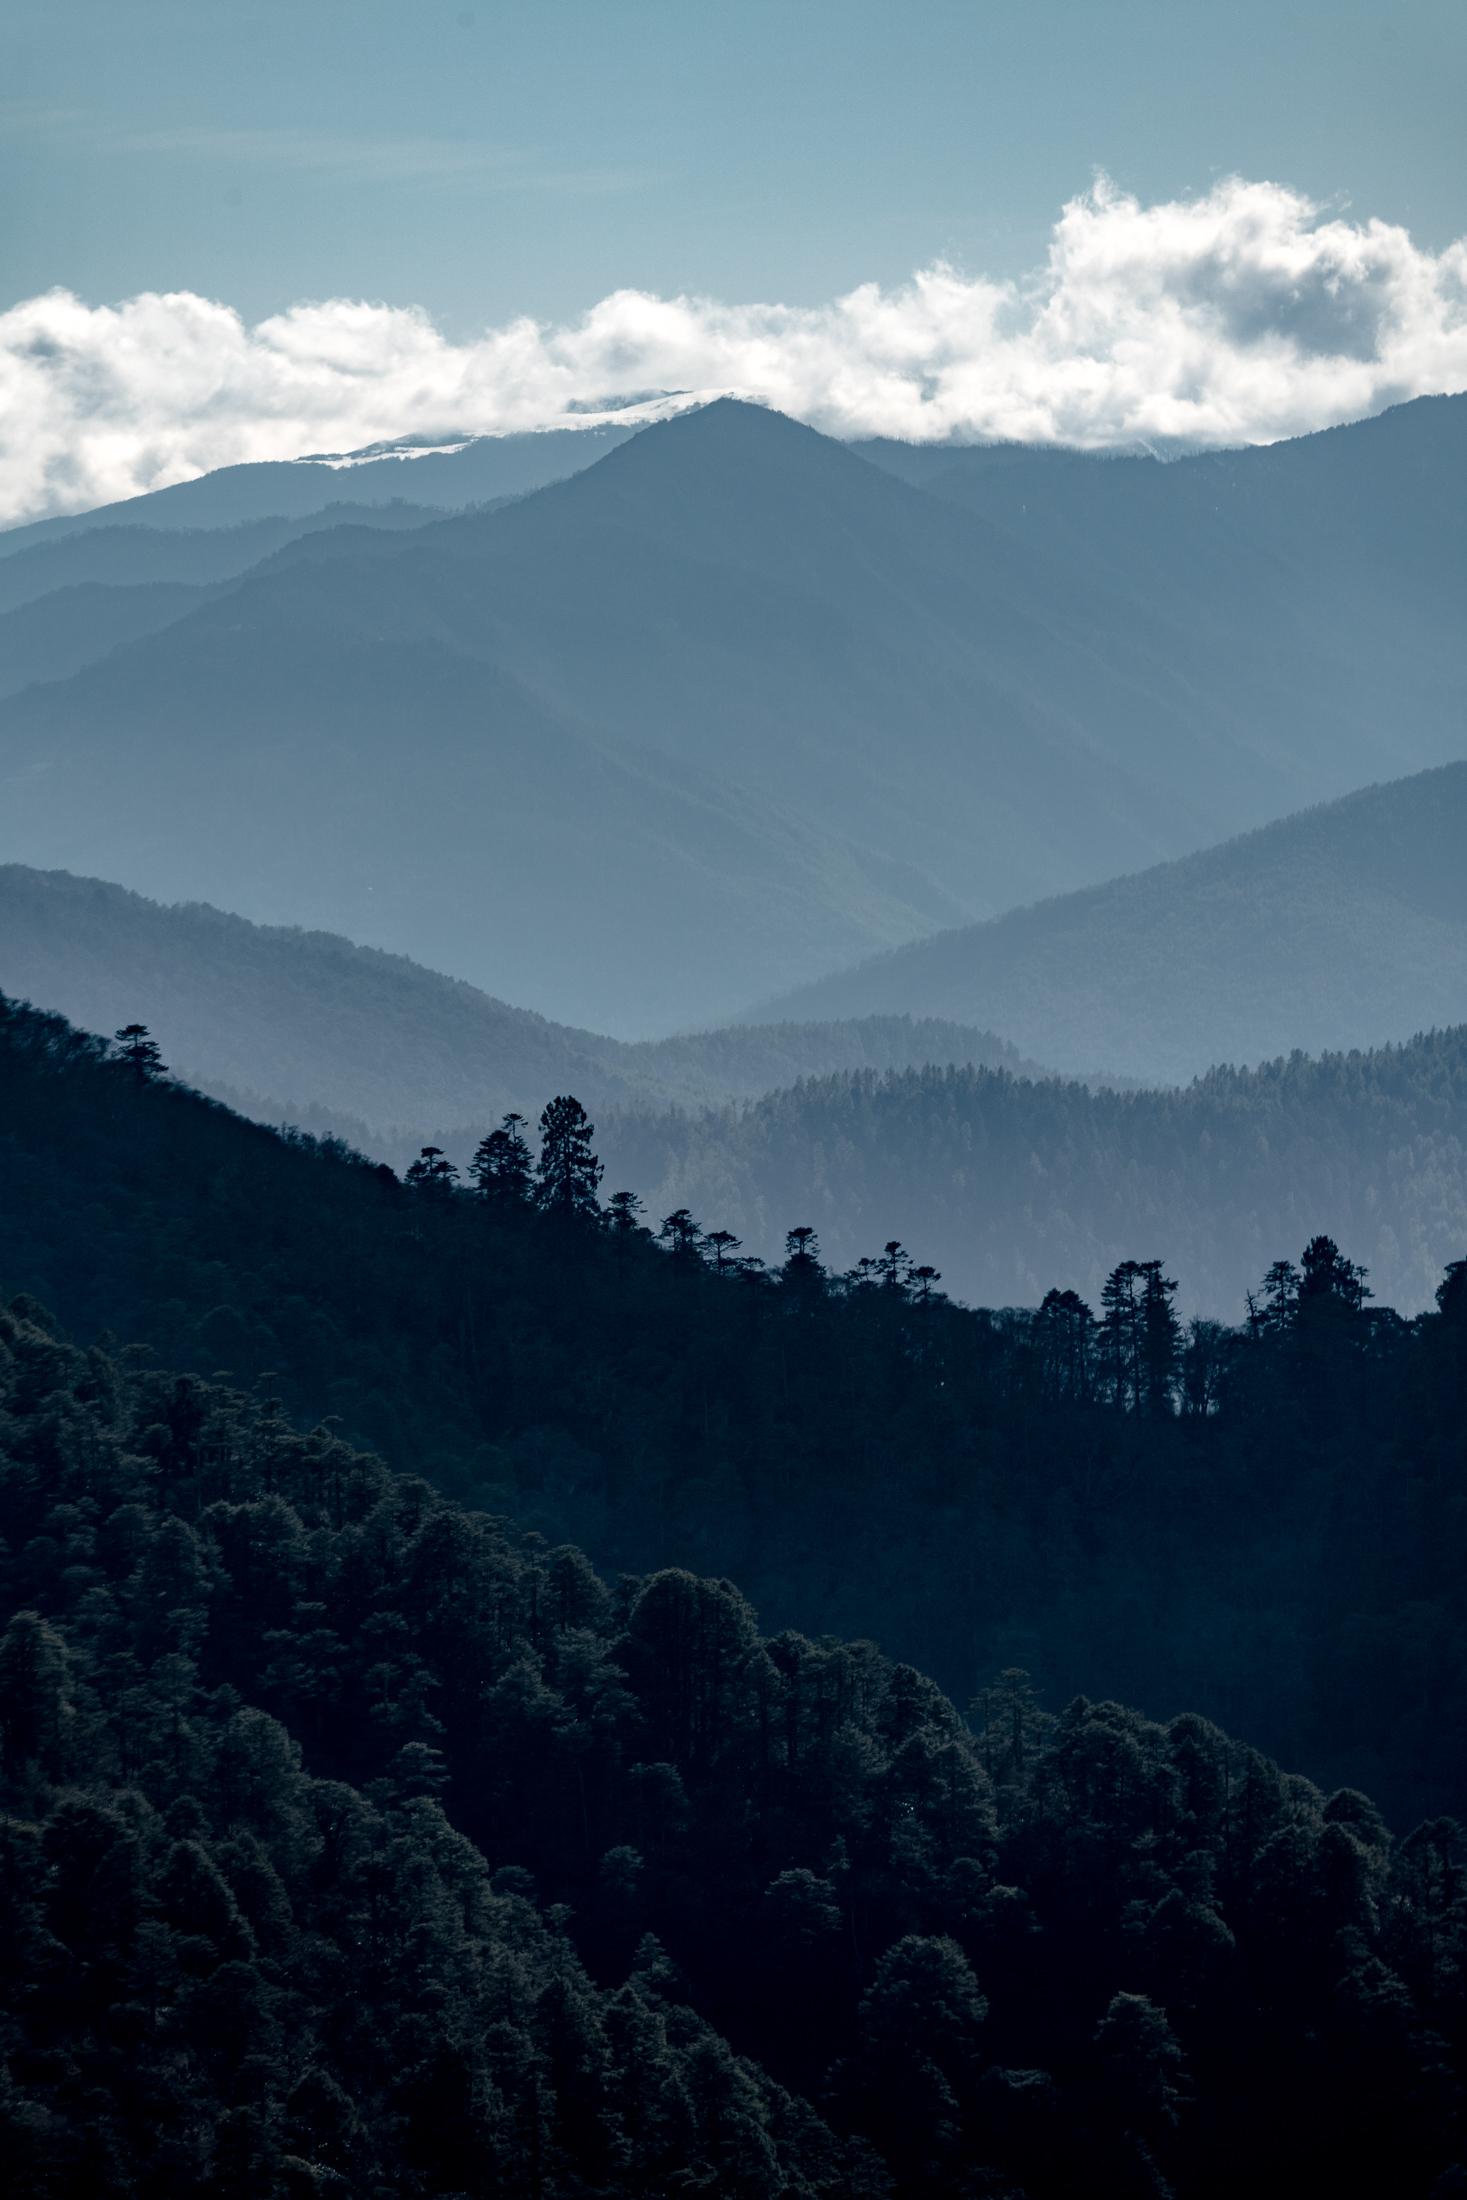 2019.04.07_LHO Bhutan_7874_2200px.jpg